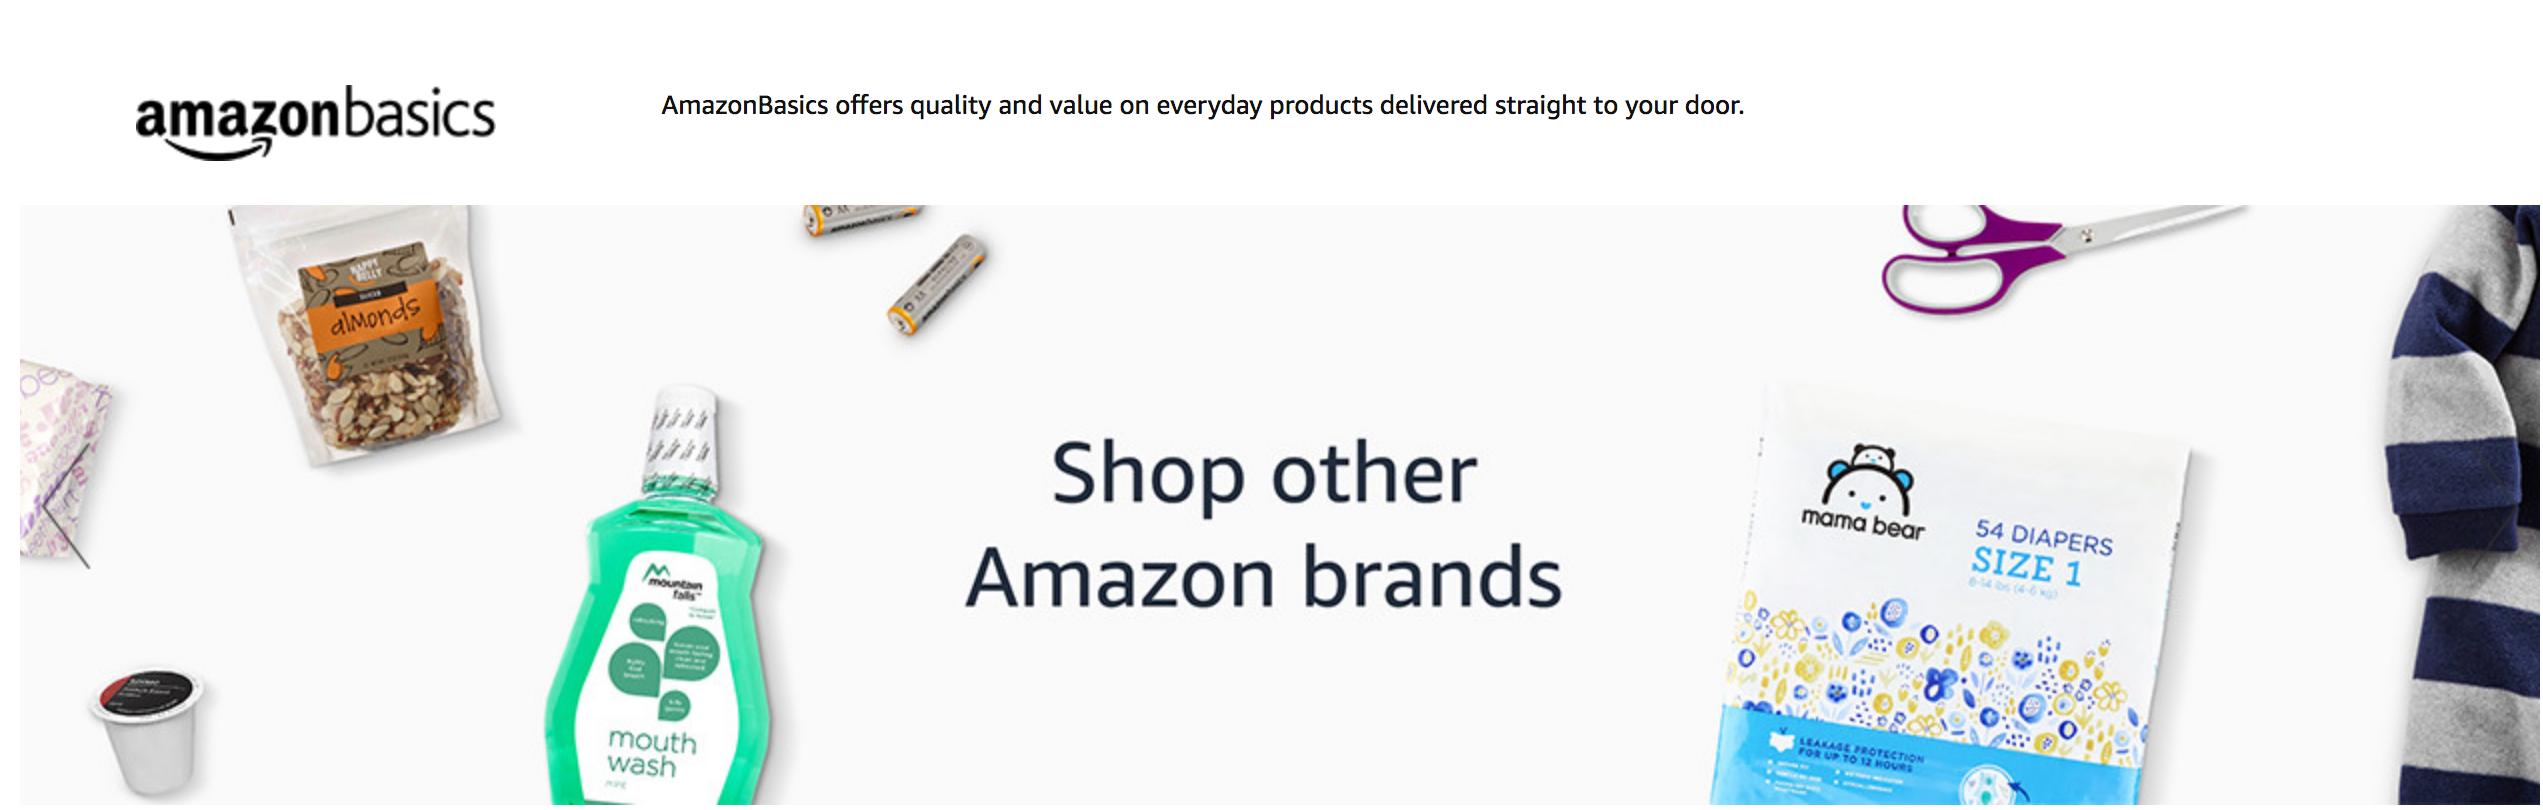 AmazonBasics and other Amazon brands